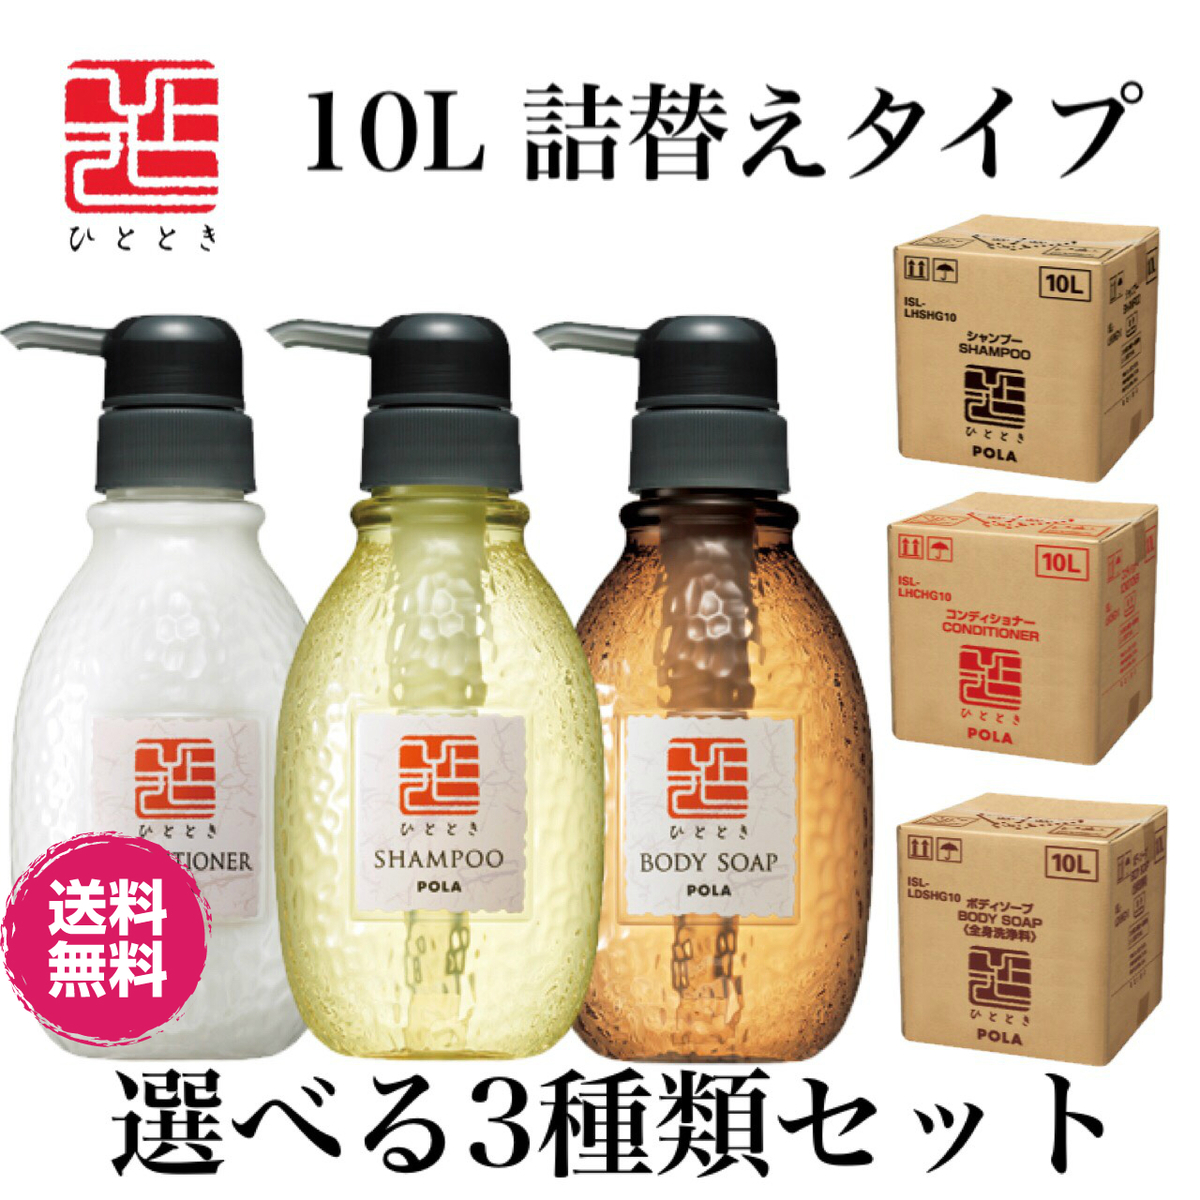 POLA/ポーラ ひととき 選べる3種類 10L×3箱【送料無料】